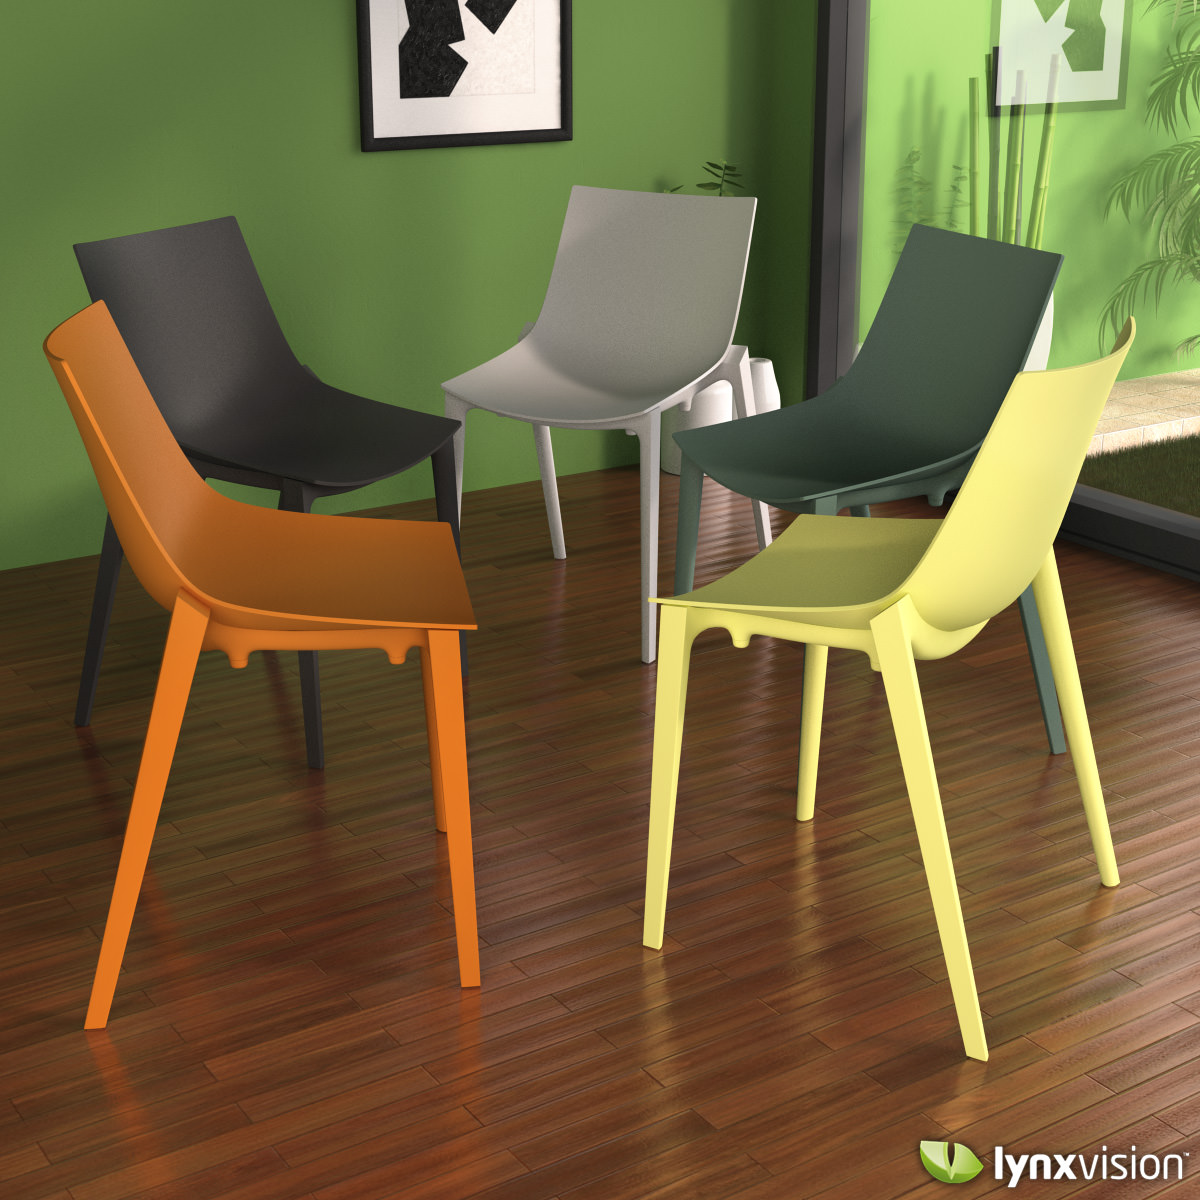 Basic chair design -  Zartan Basic Chair By Starck Quitllet 3d Model Max Obj Fbx Mtl 2